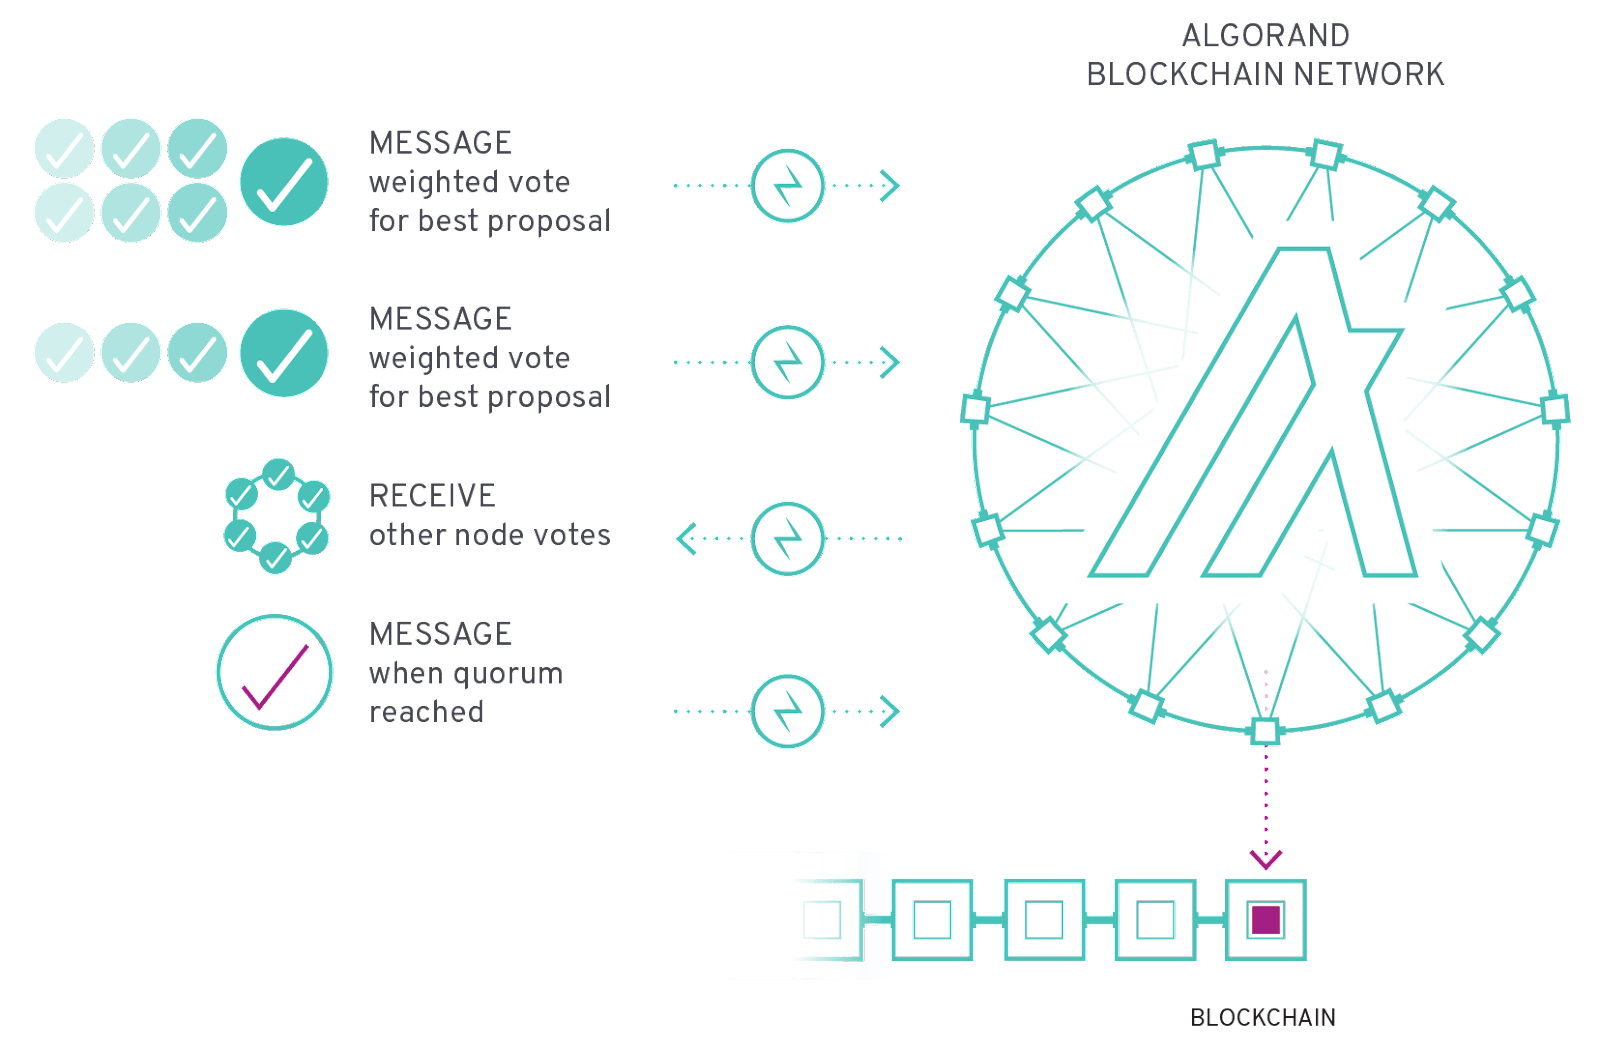 Algorand Blockchain Network